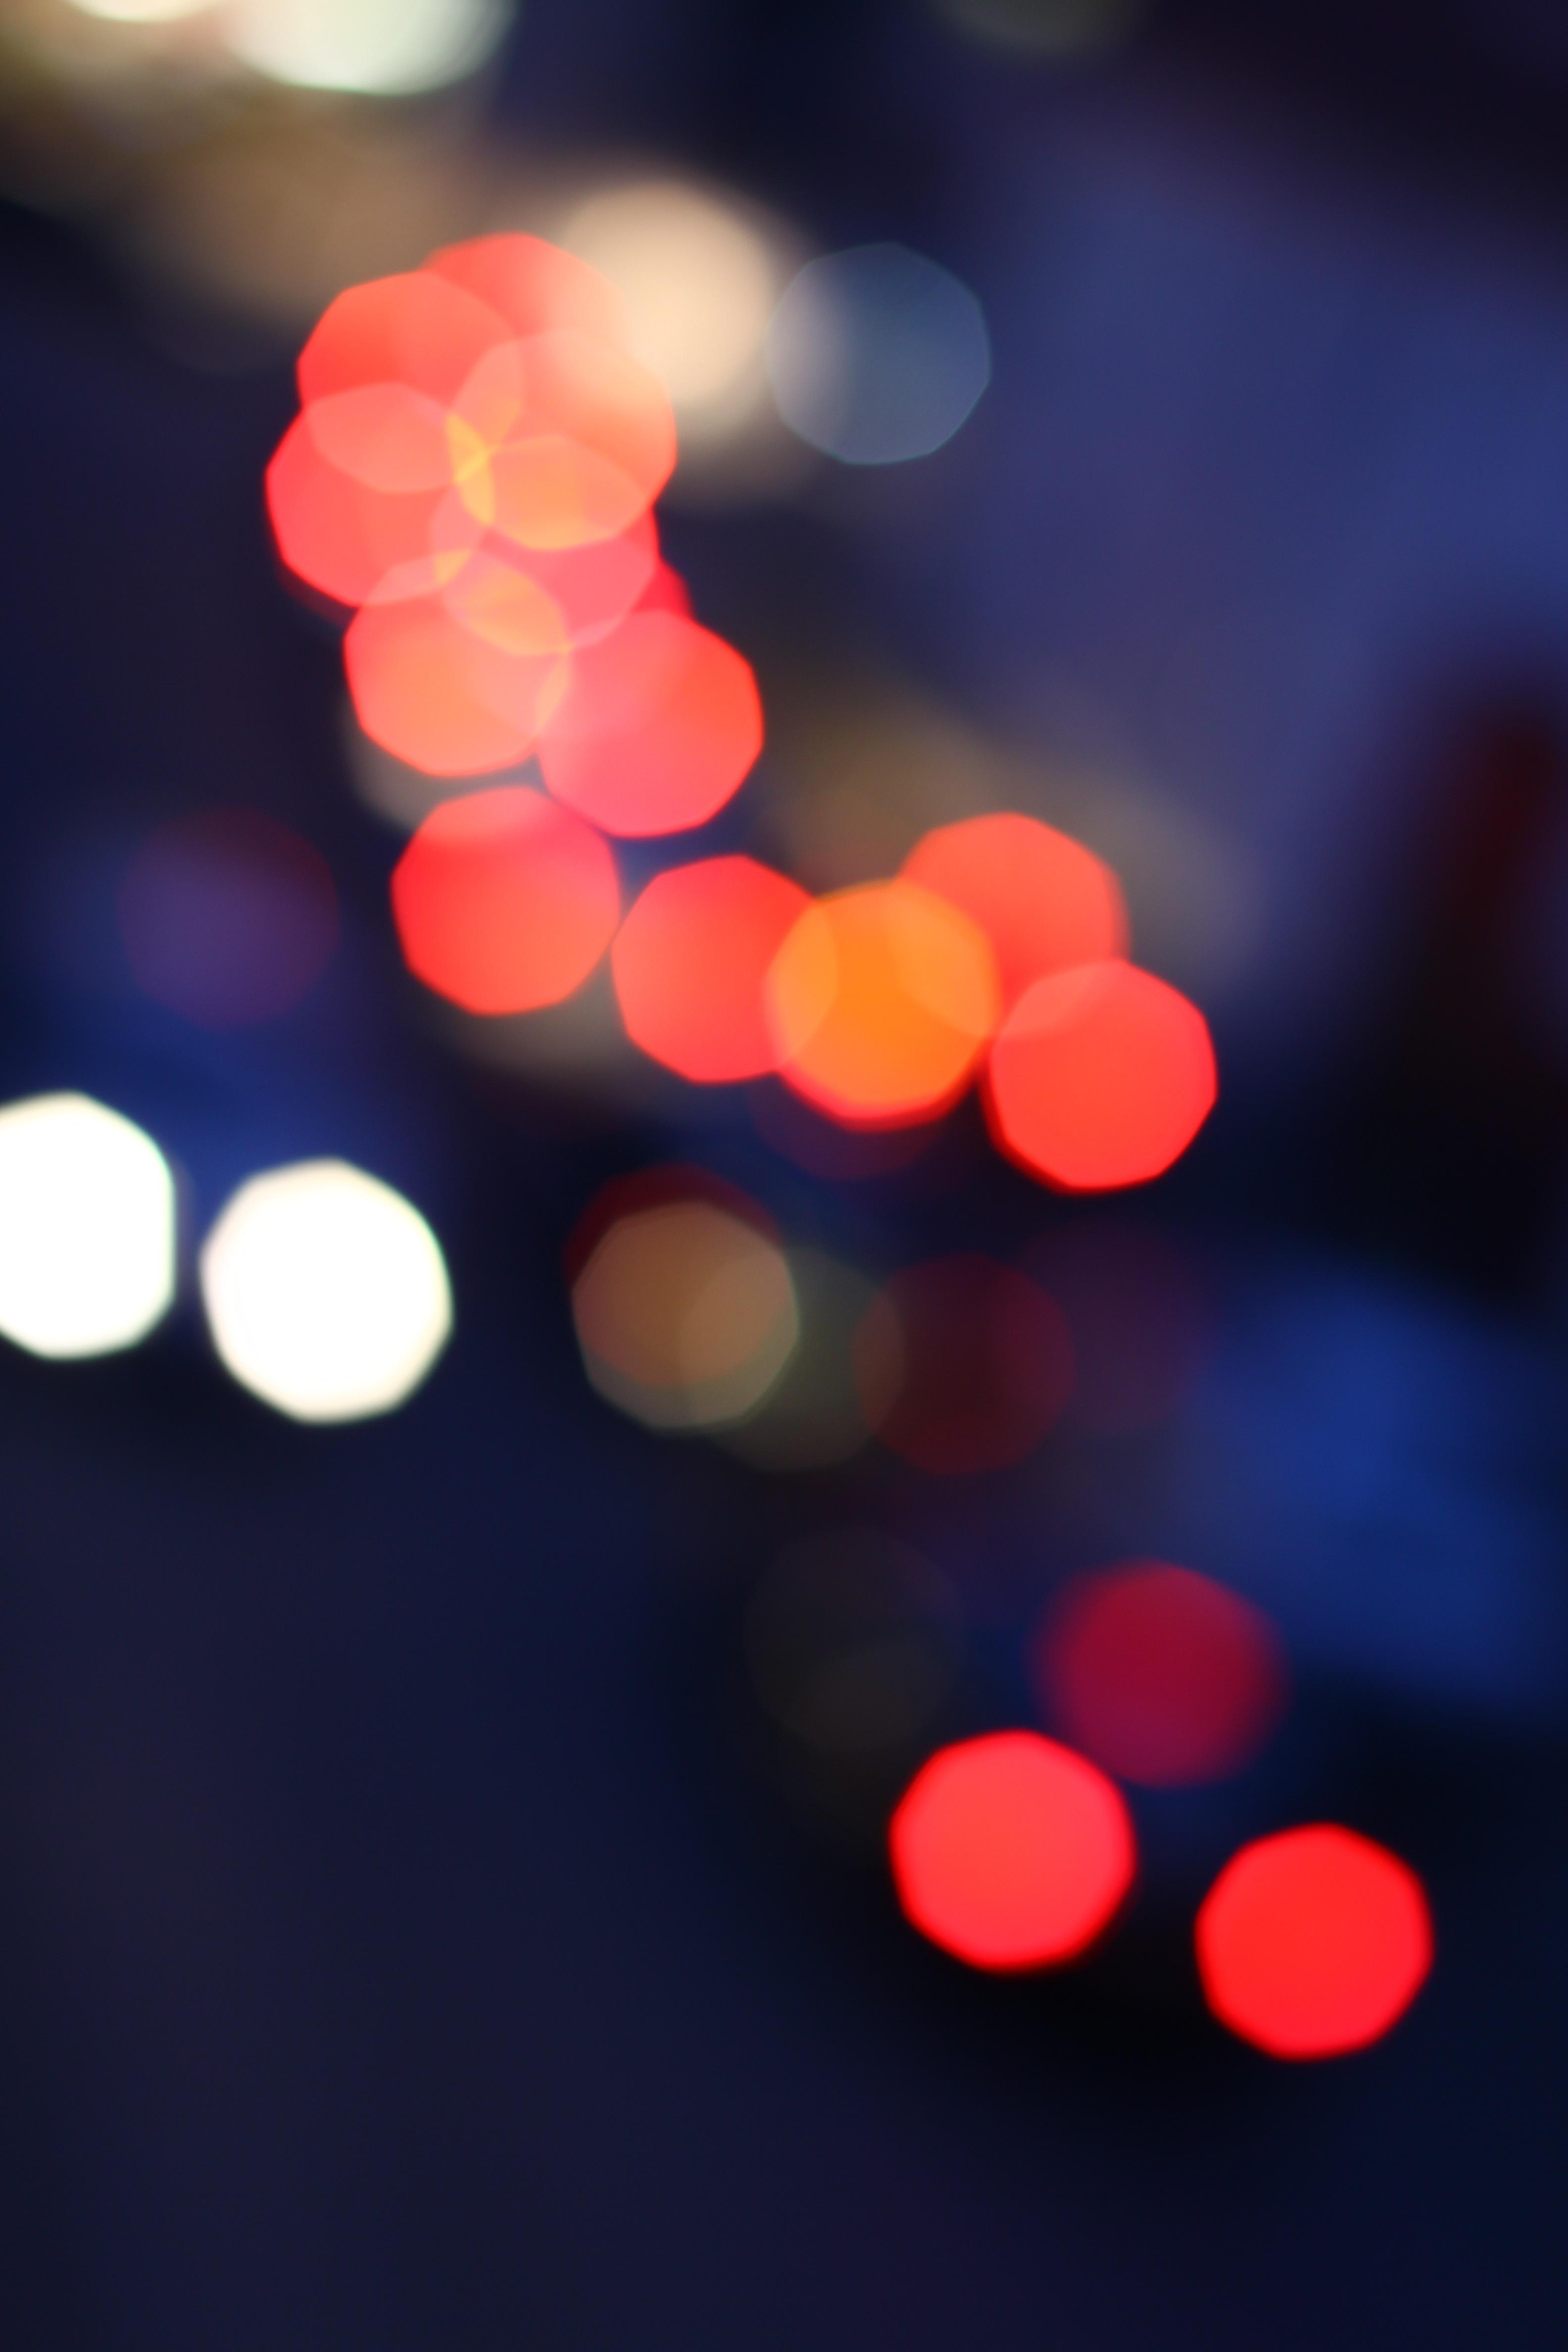 Download 910+ Background Bunga Lampu HD Terbaru